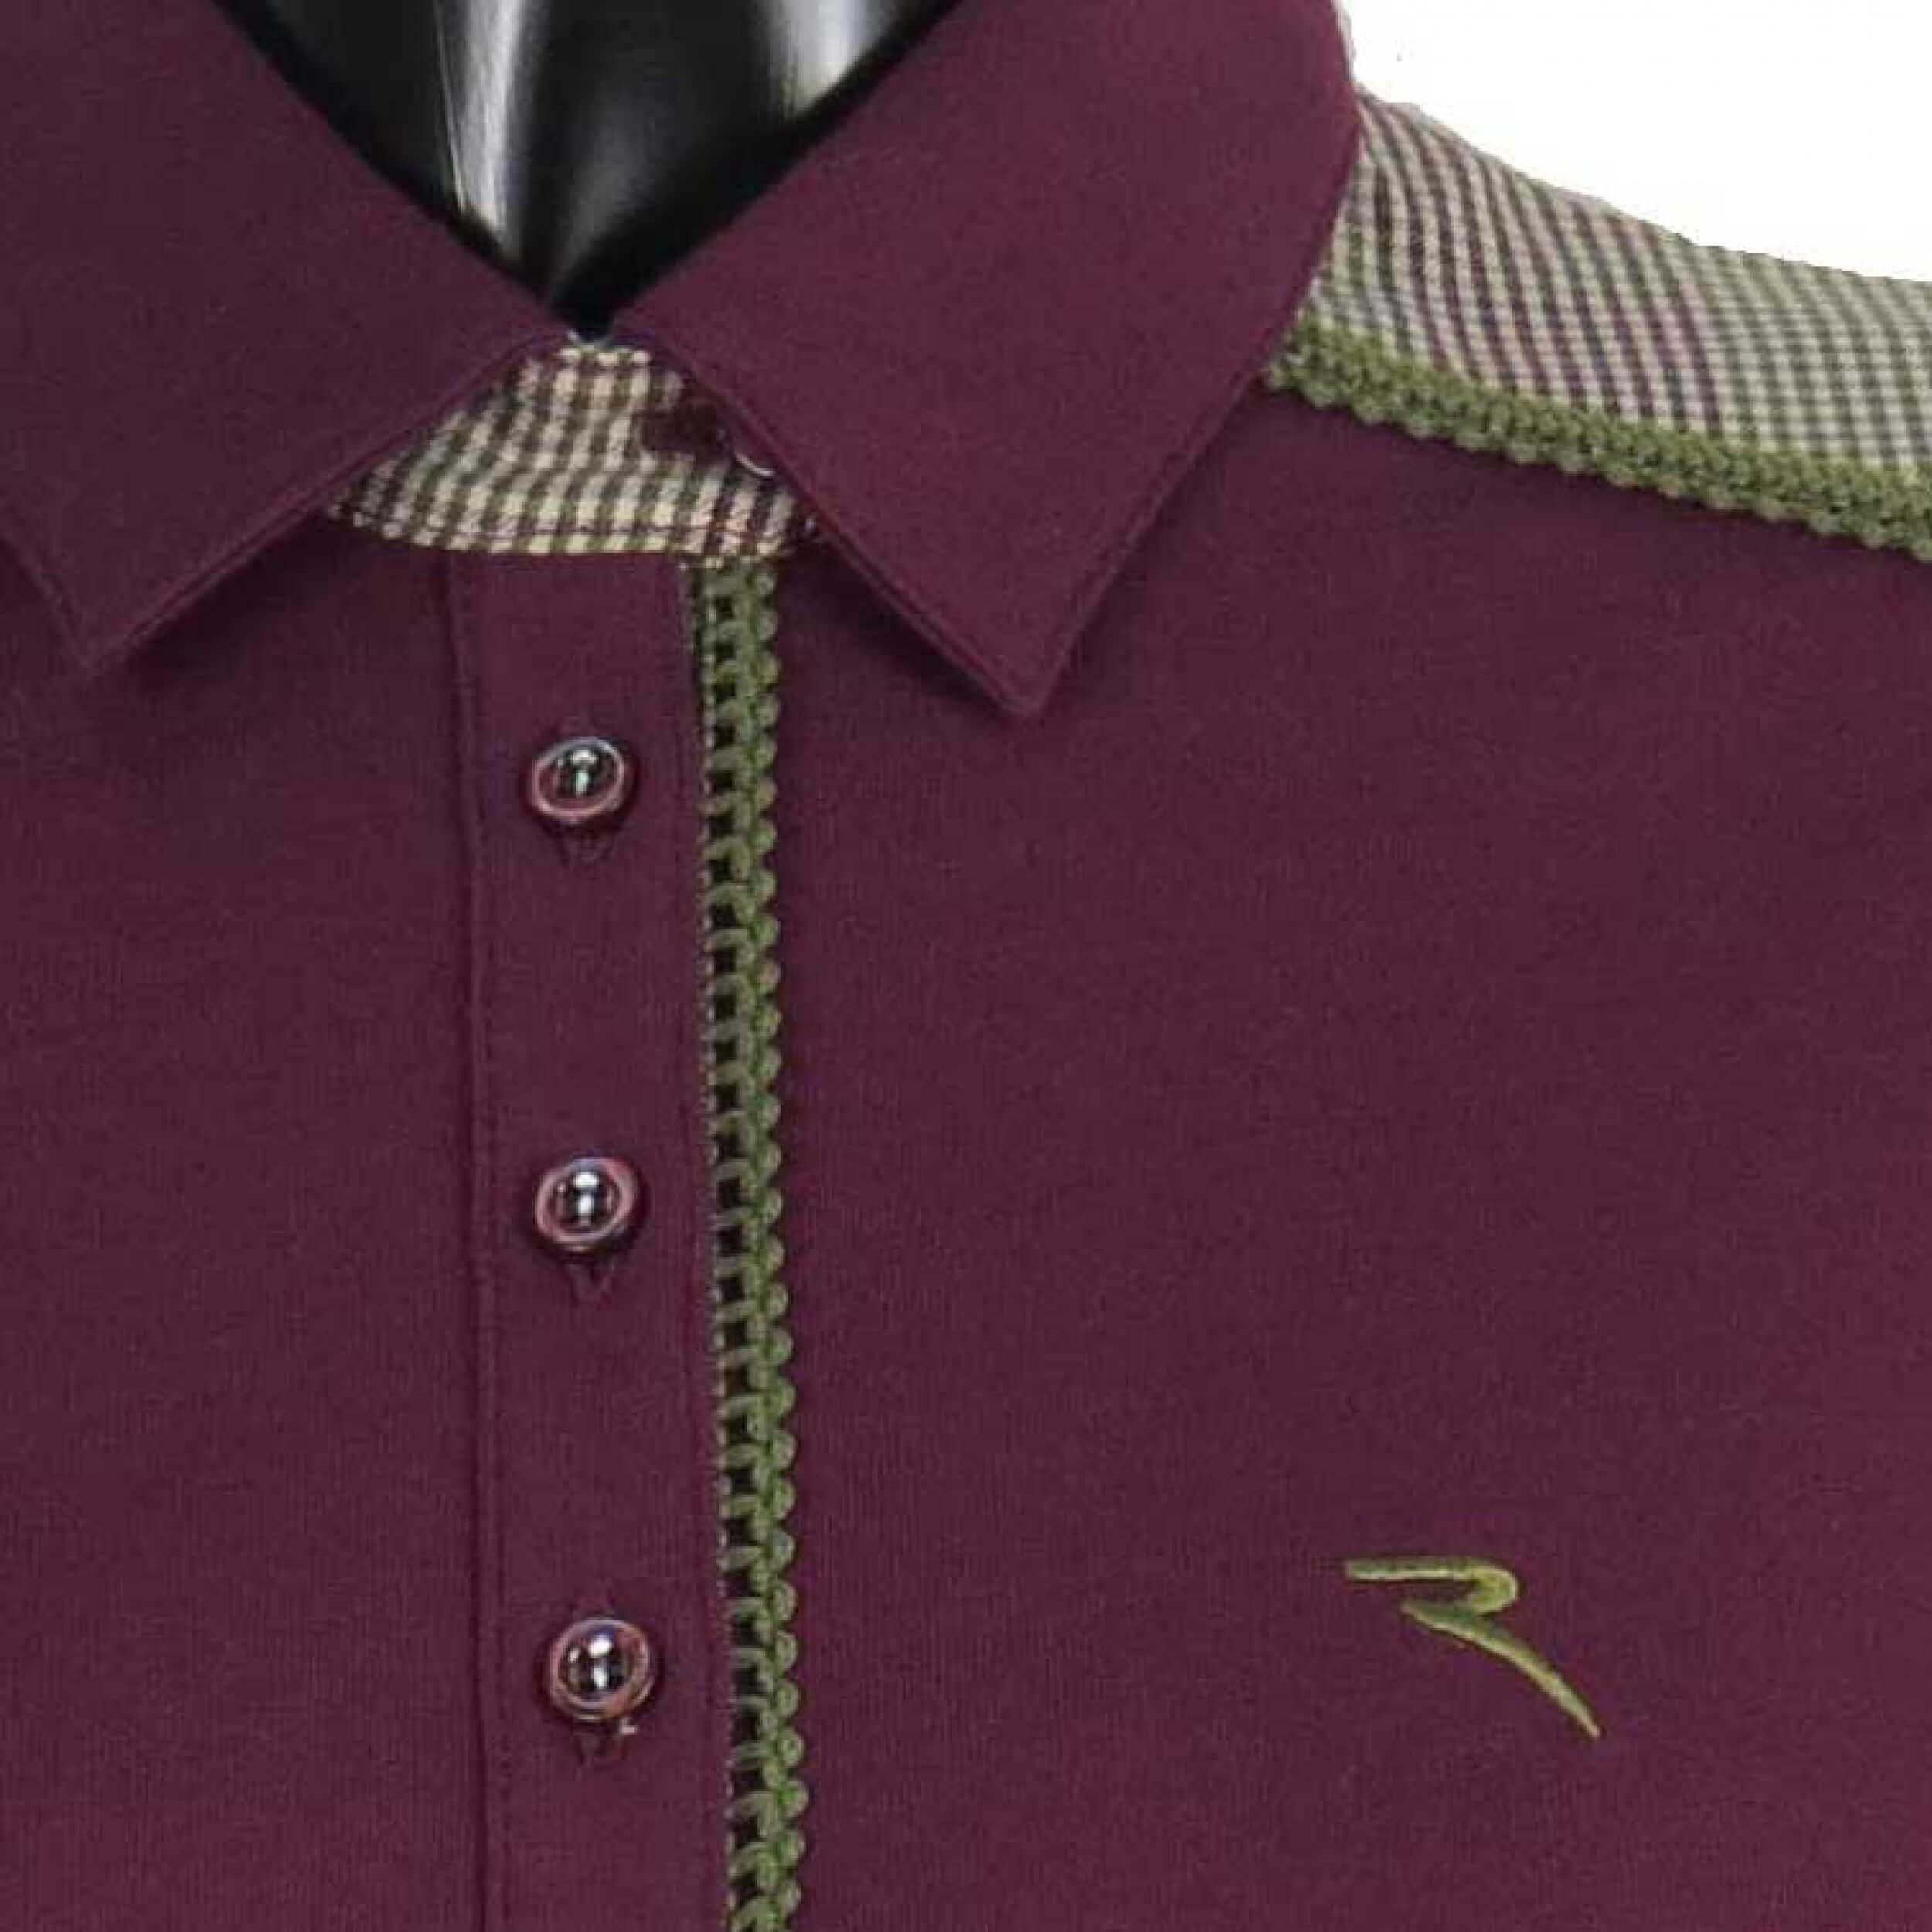 Chervo Polo Golfpolo lang Arm Aerea 896 bordeaux Gr. 36